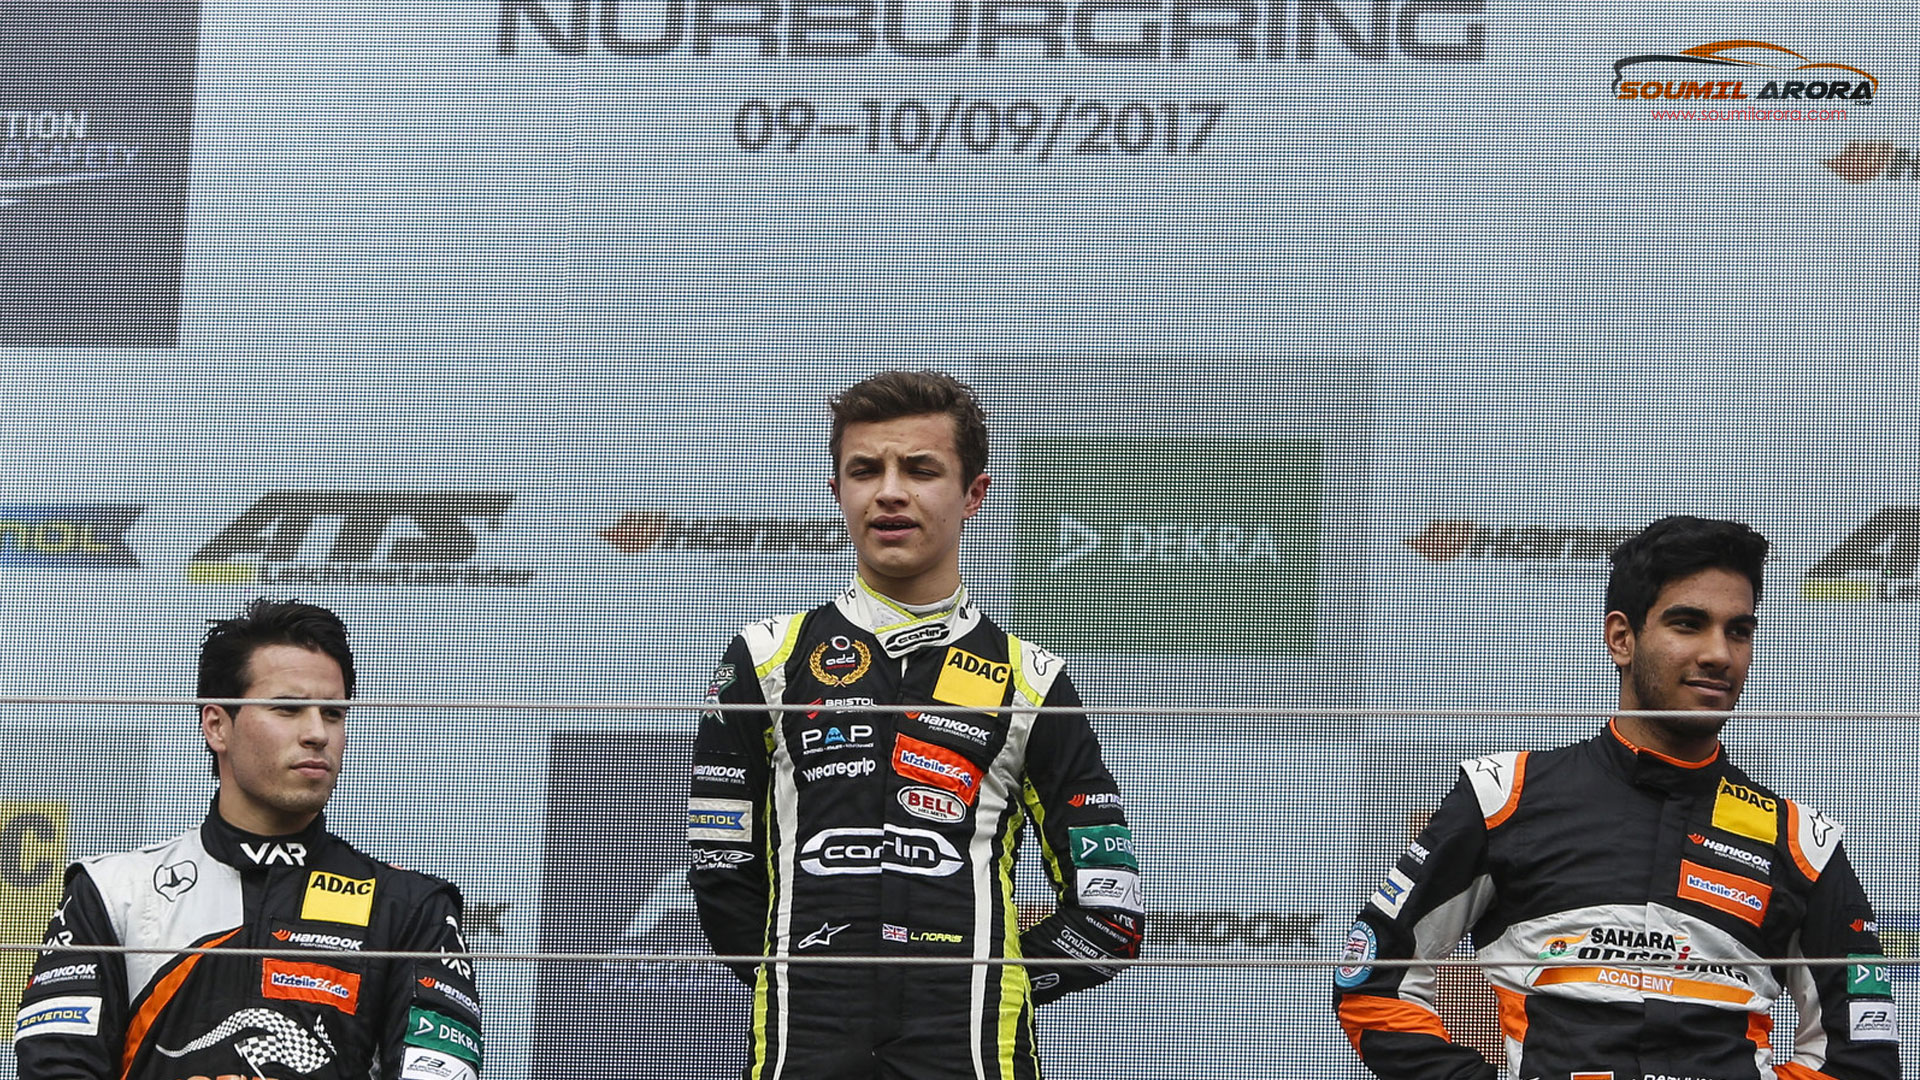 Jehan Daruvala Podium Finish at Nurburgring Racetrack